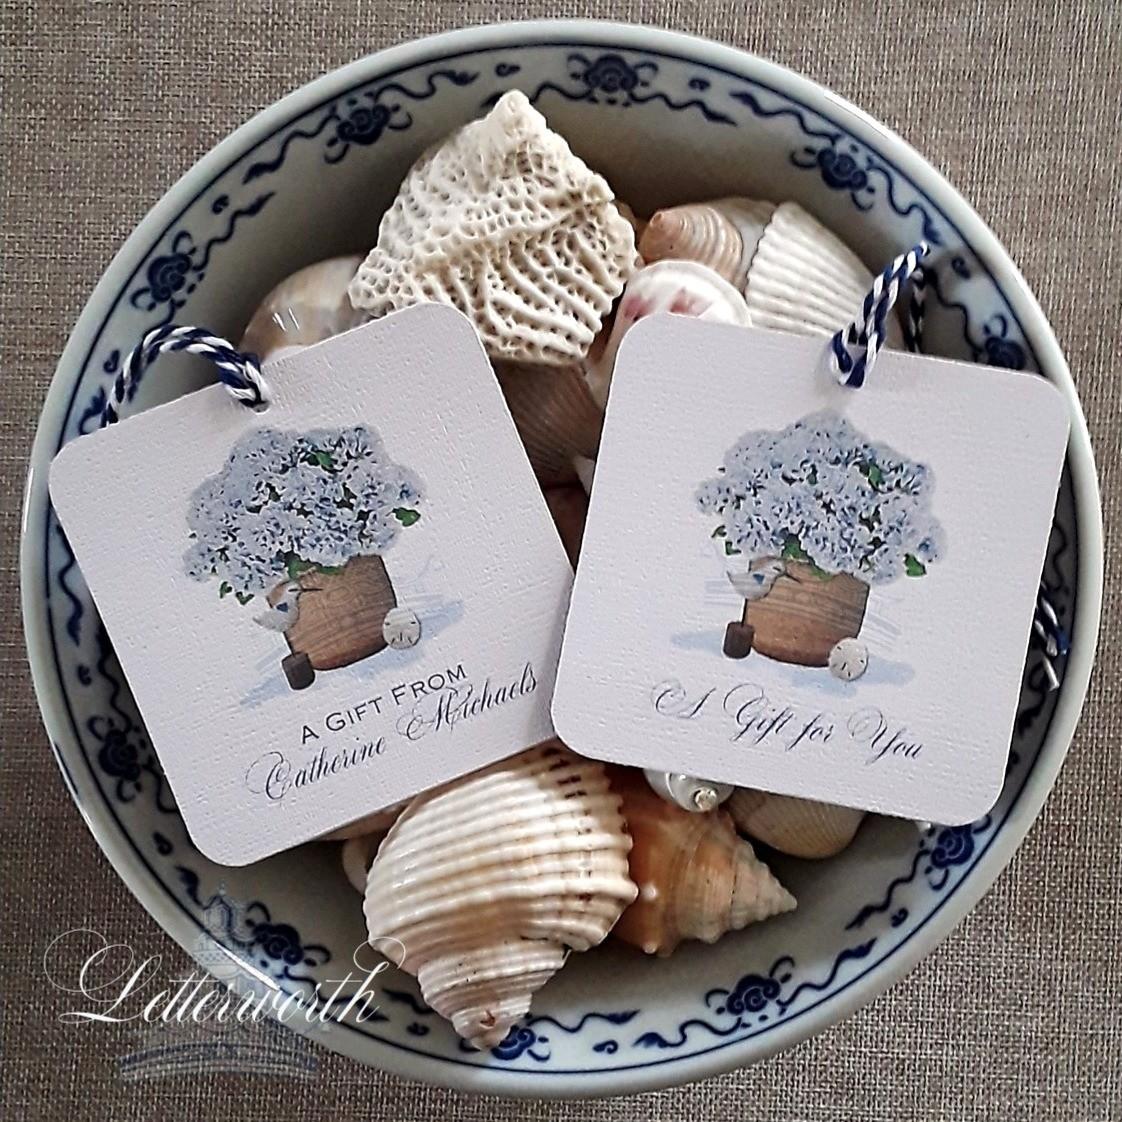 Blue Hydrangeas in Nantucket Basket Watercolor Gift Tags by Letterworth (Set of 12)